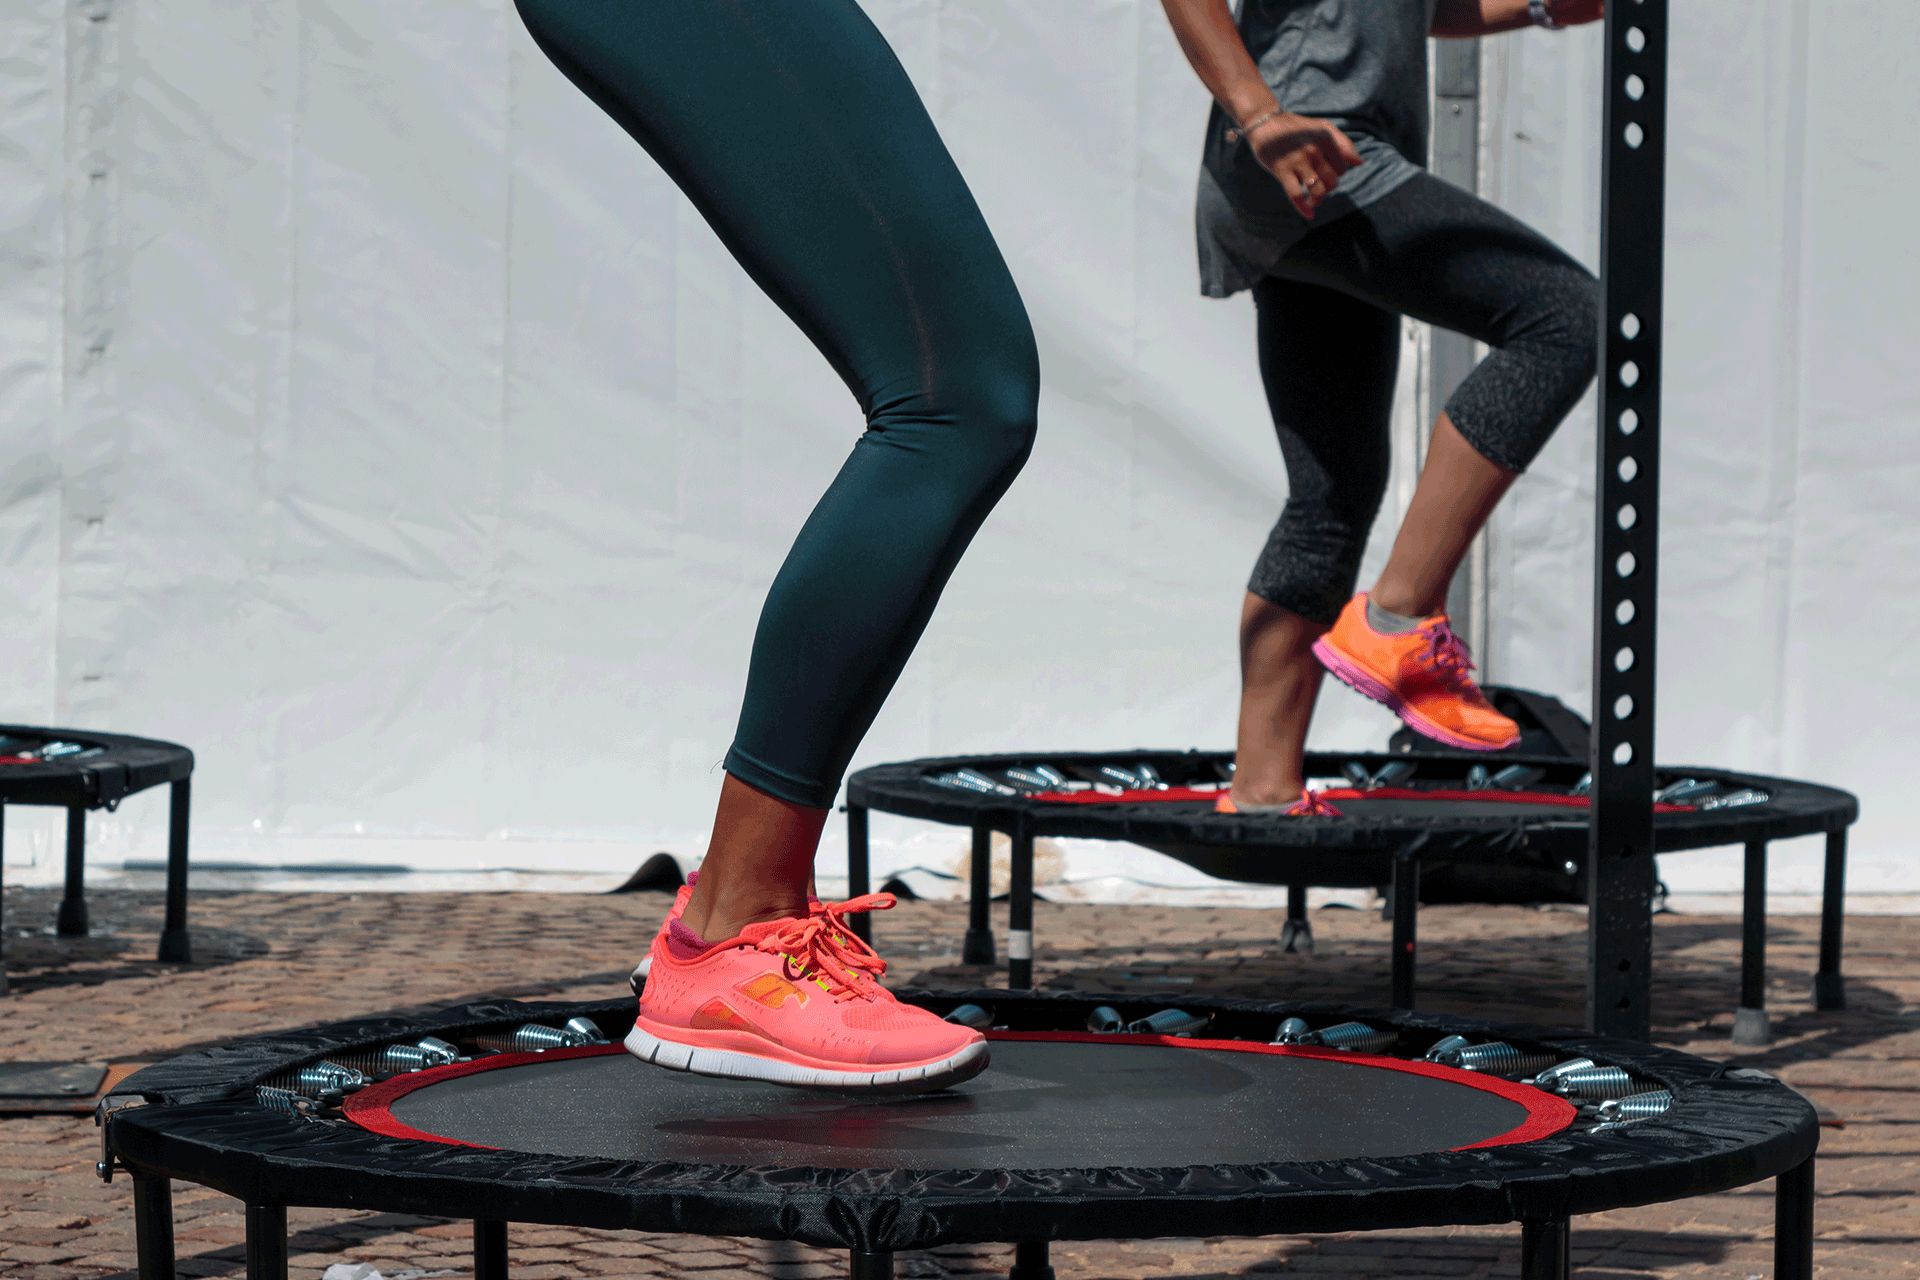 trampoline / rebounding